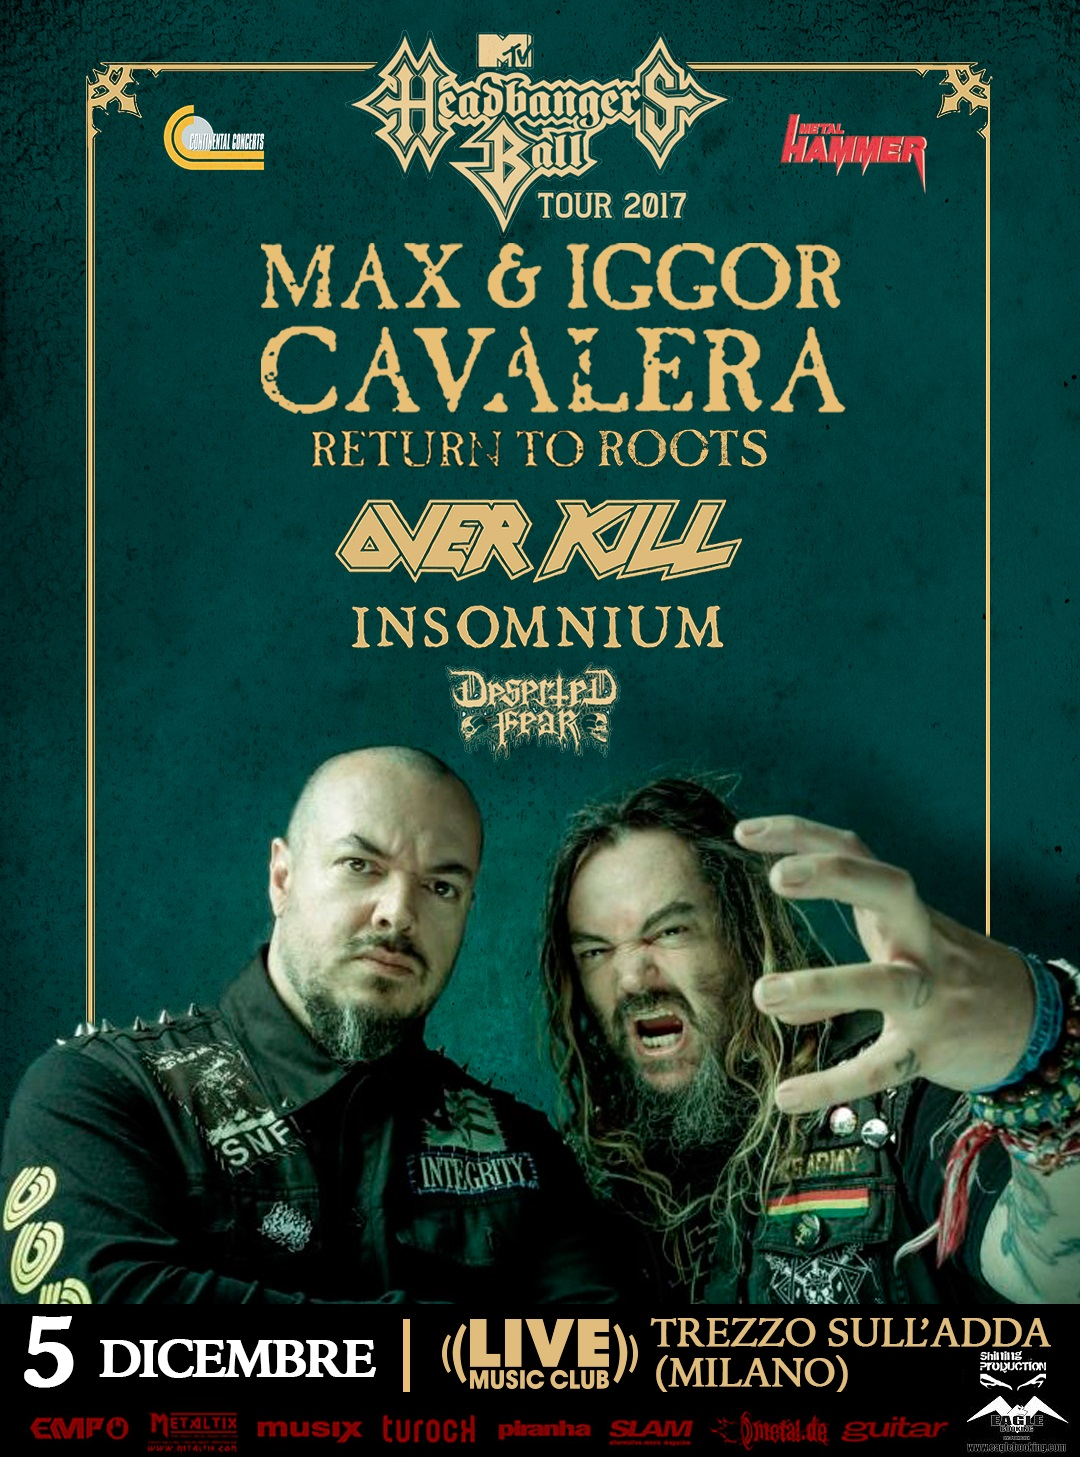 Max & Igor Cavalera - Overkill - Insomnium - Deserted Fear - Live Music Club - Return To Roots 2018 - Promo